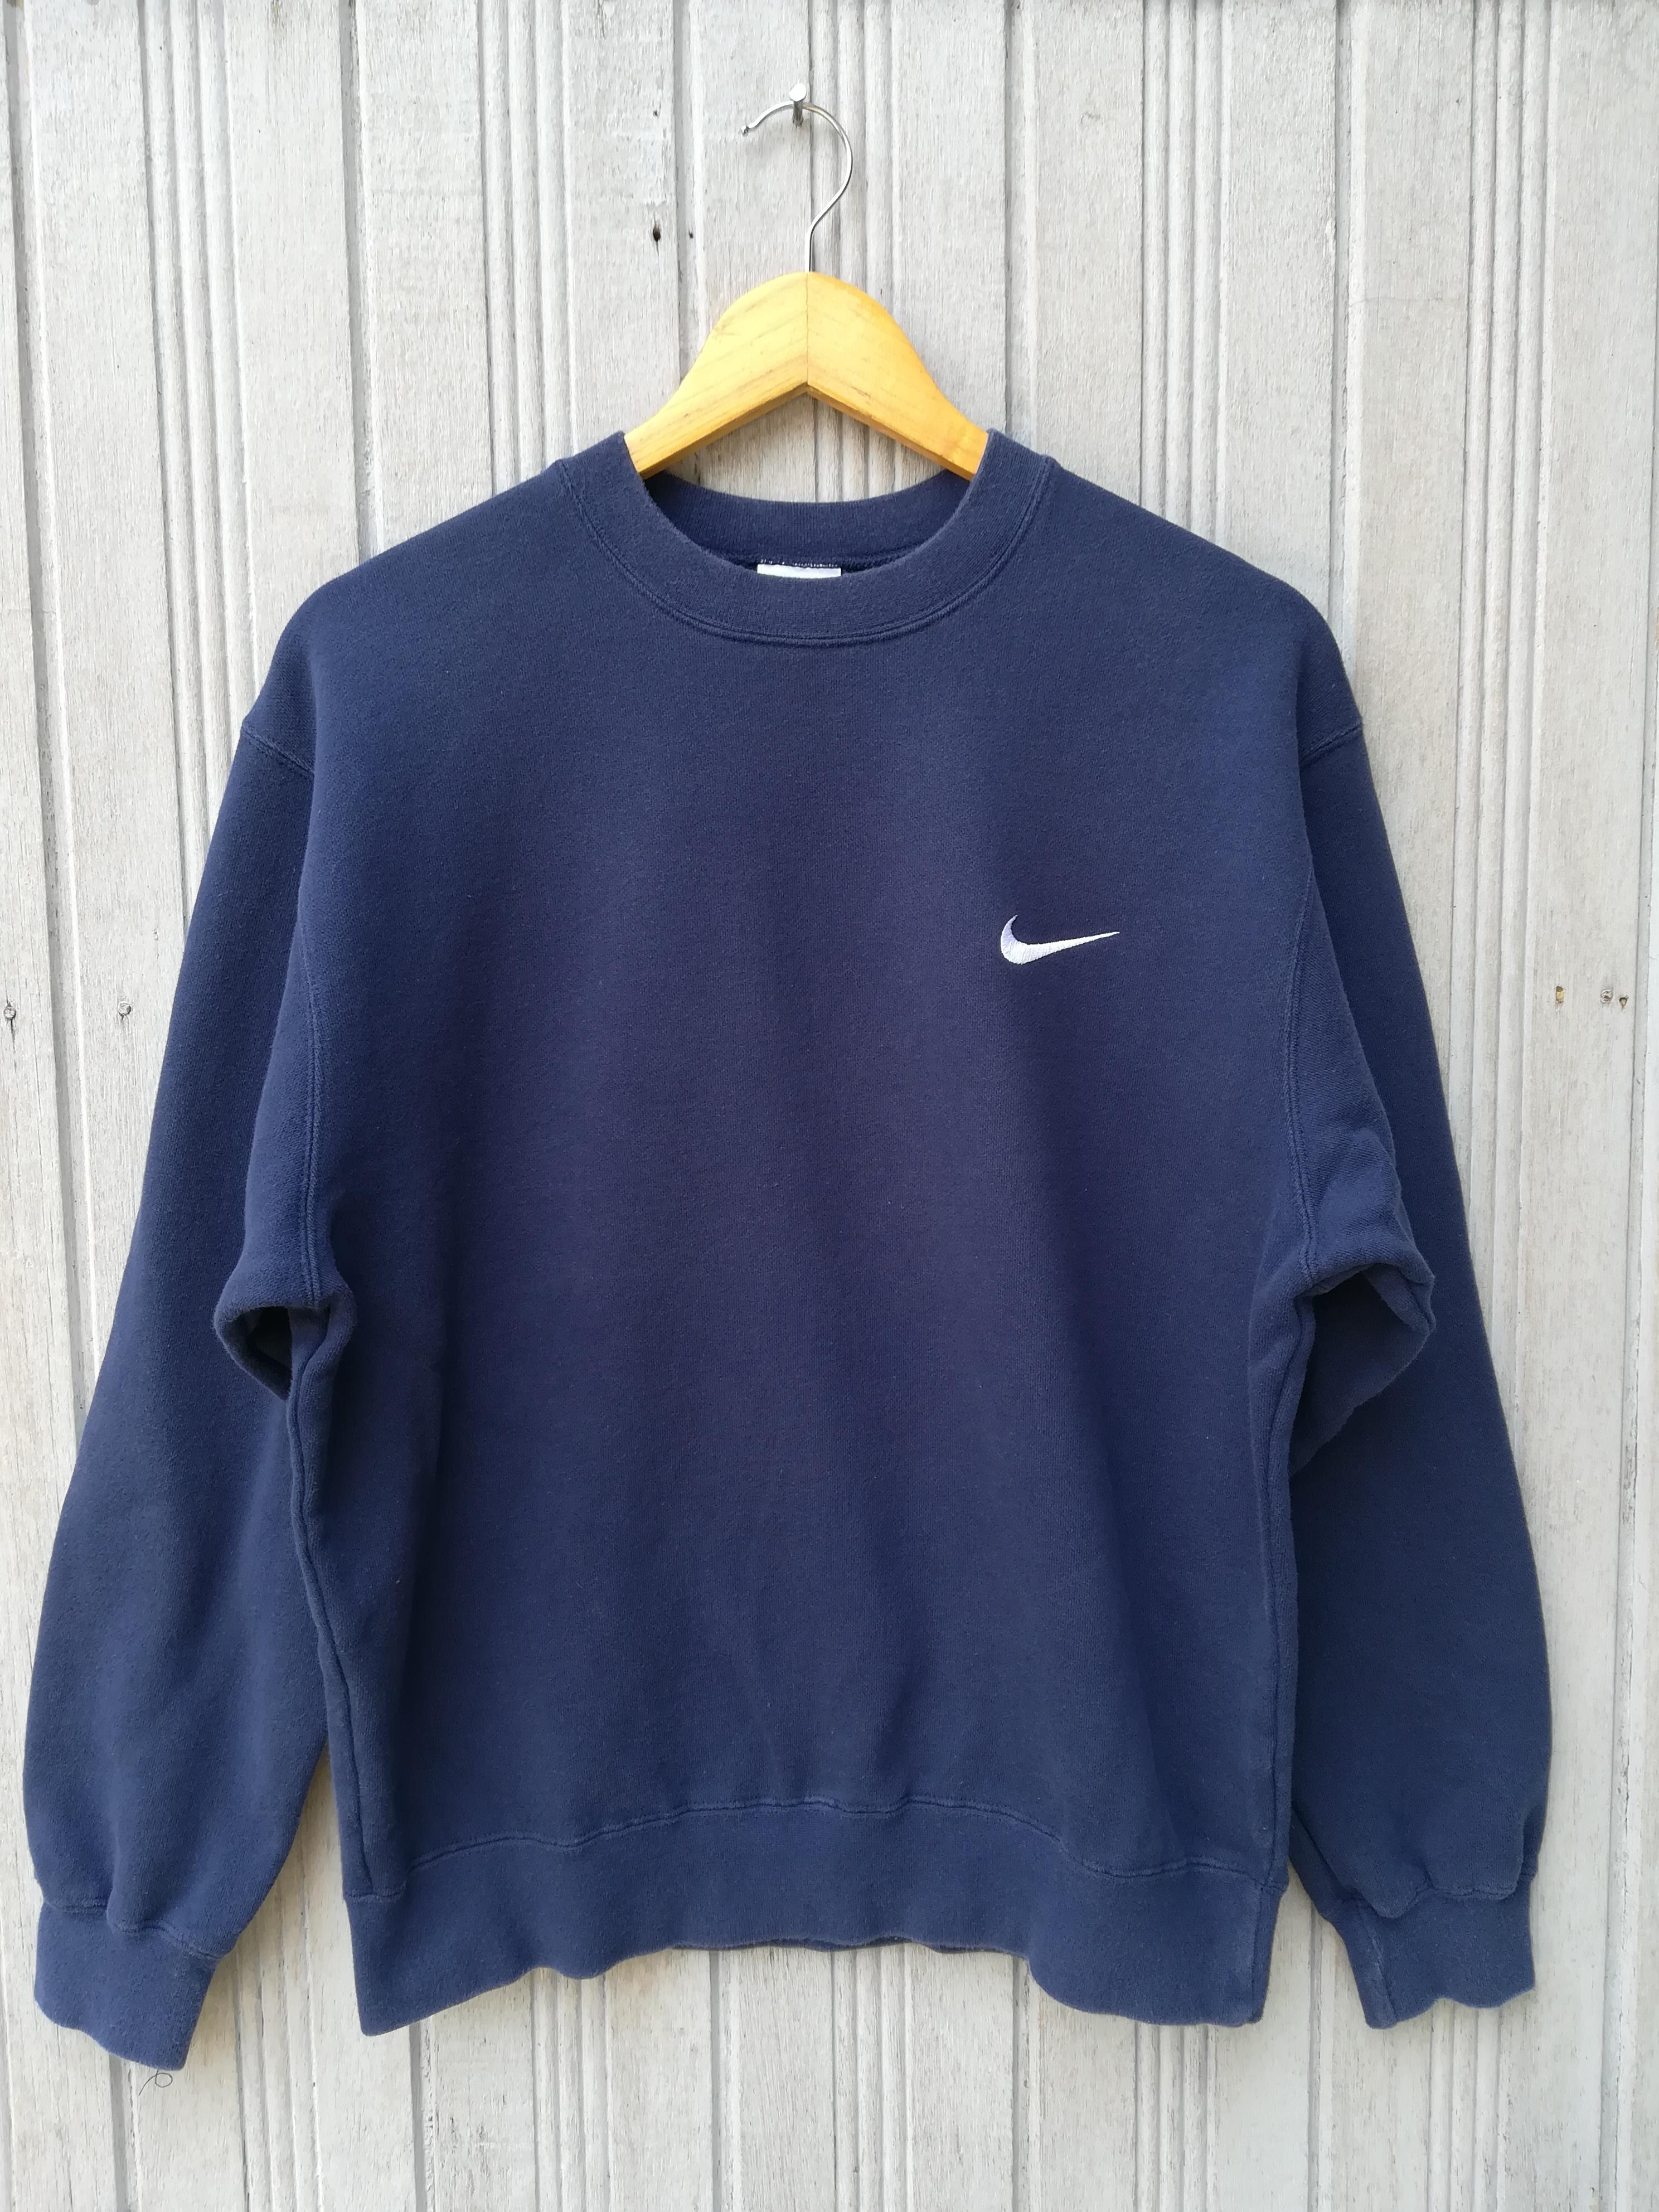 3da1c3c99a8f Nike Vintage Nike Sweatshirt Size l - Sweatshirts   Hoodies for Sale ...